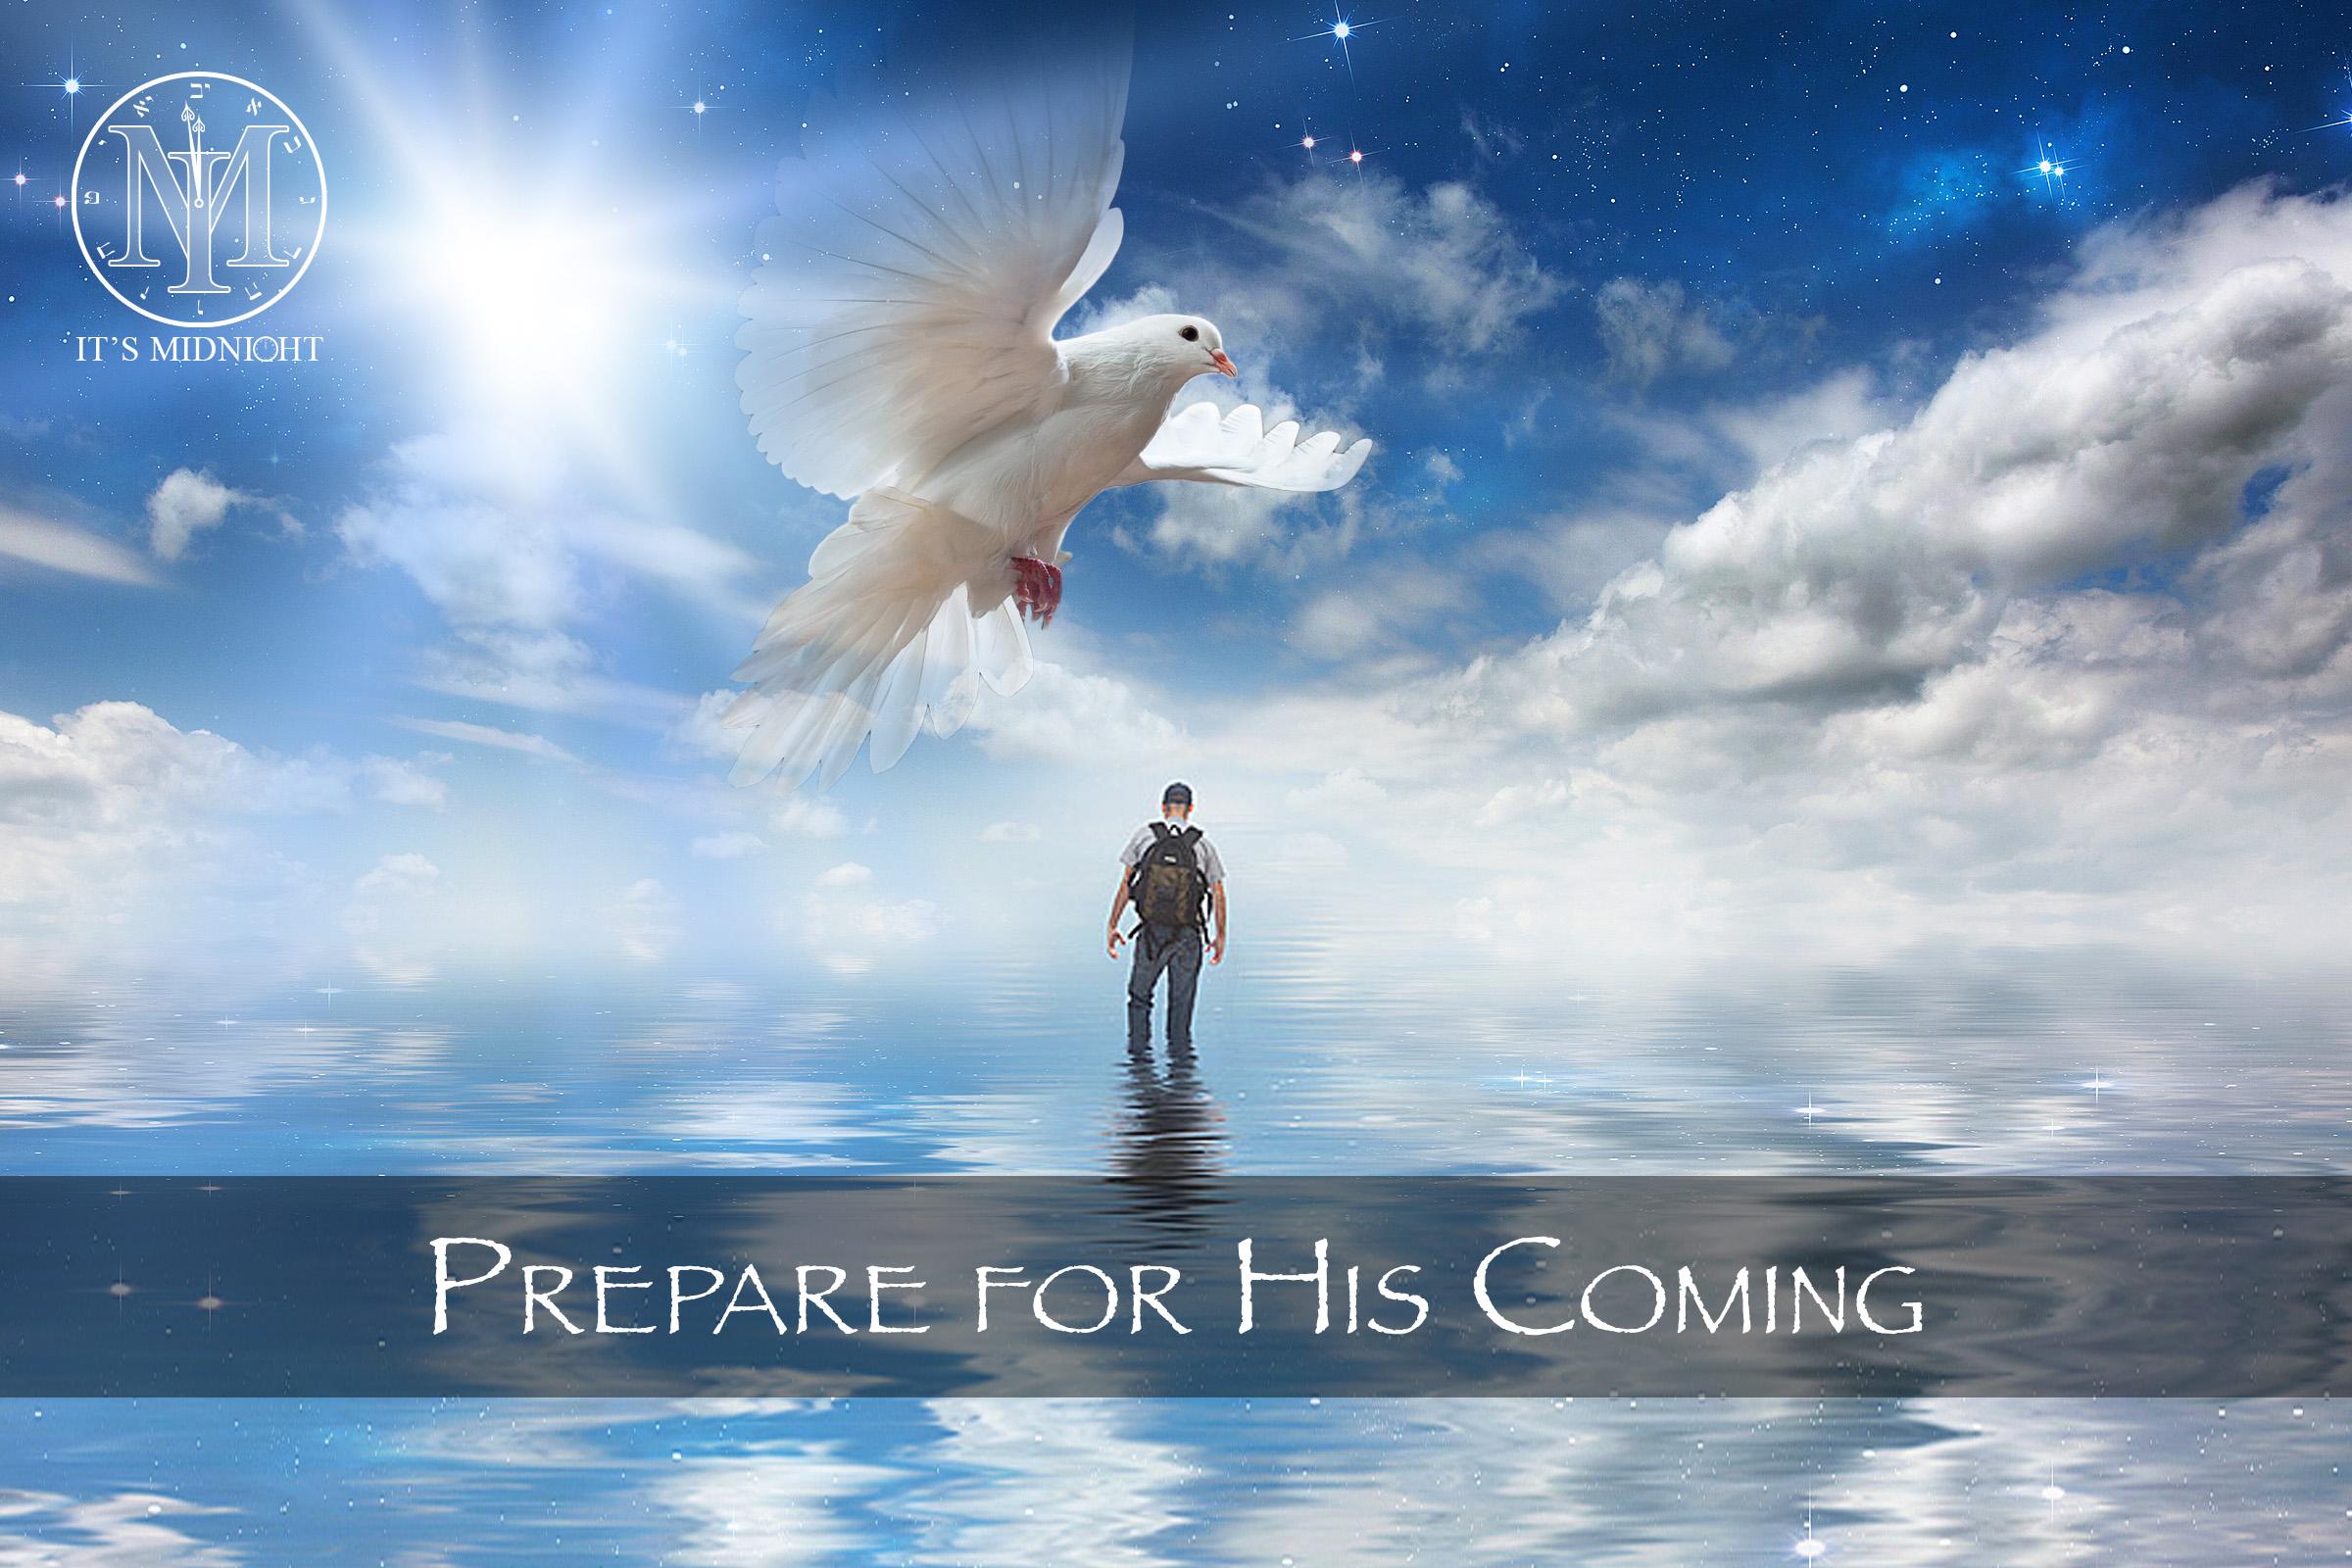 Prepare for His Coming (Thumbnail).jpg